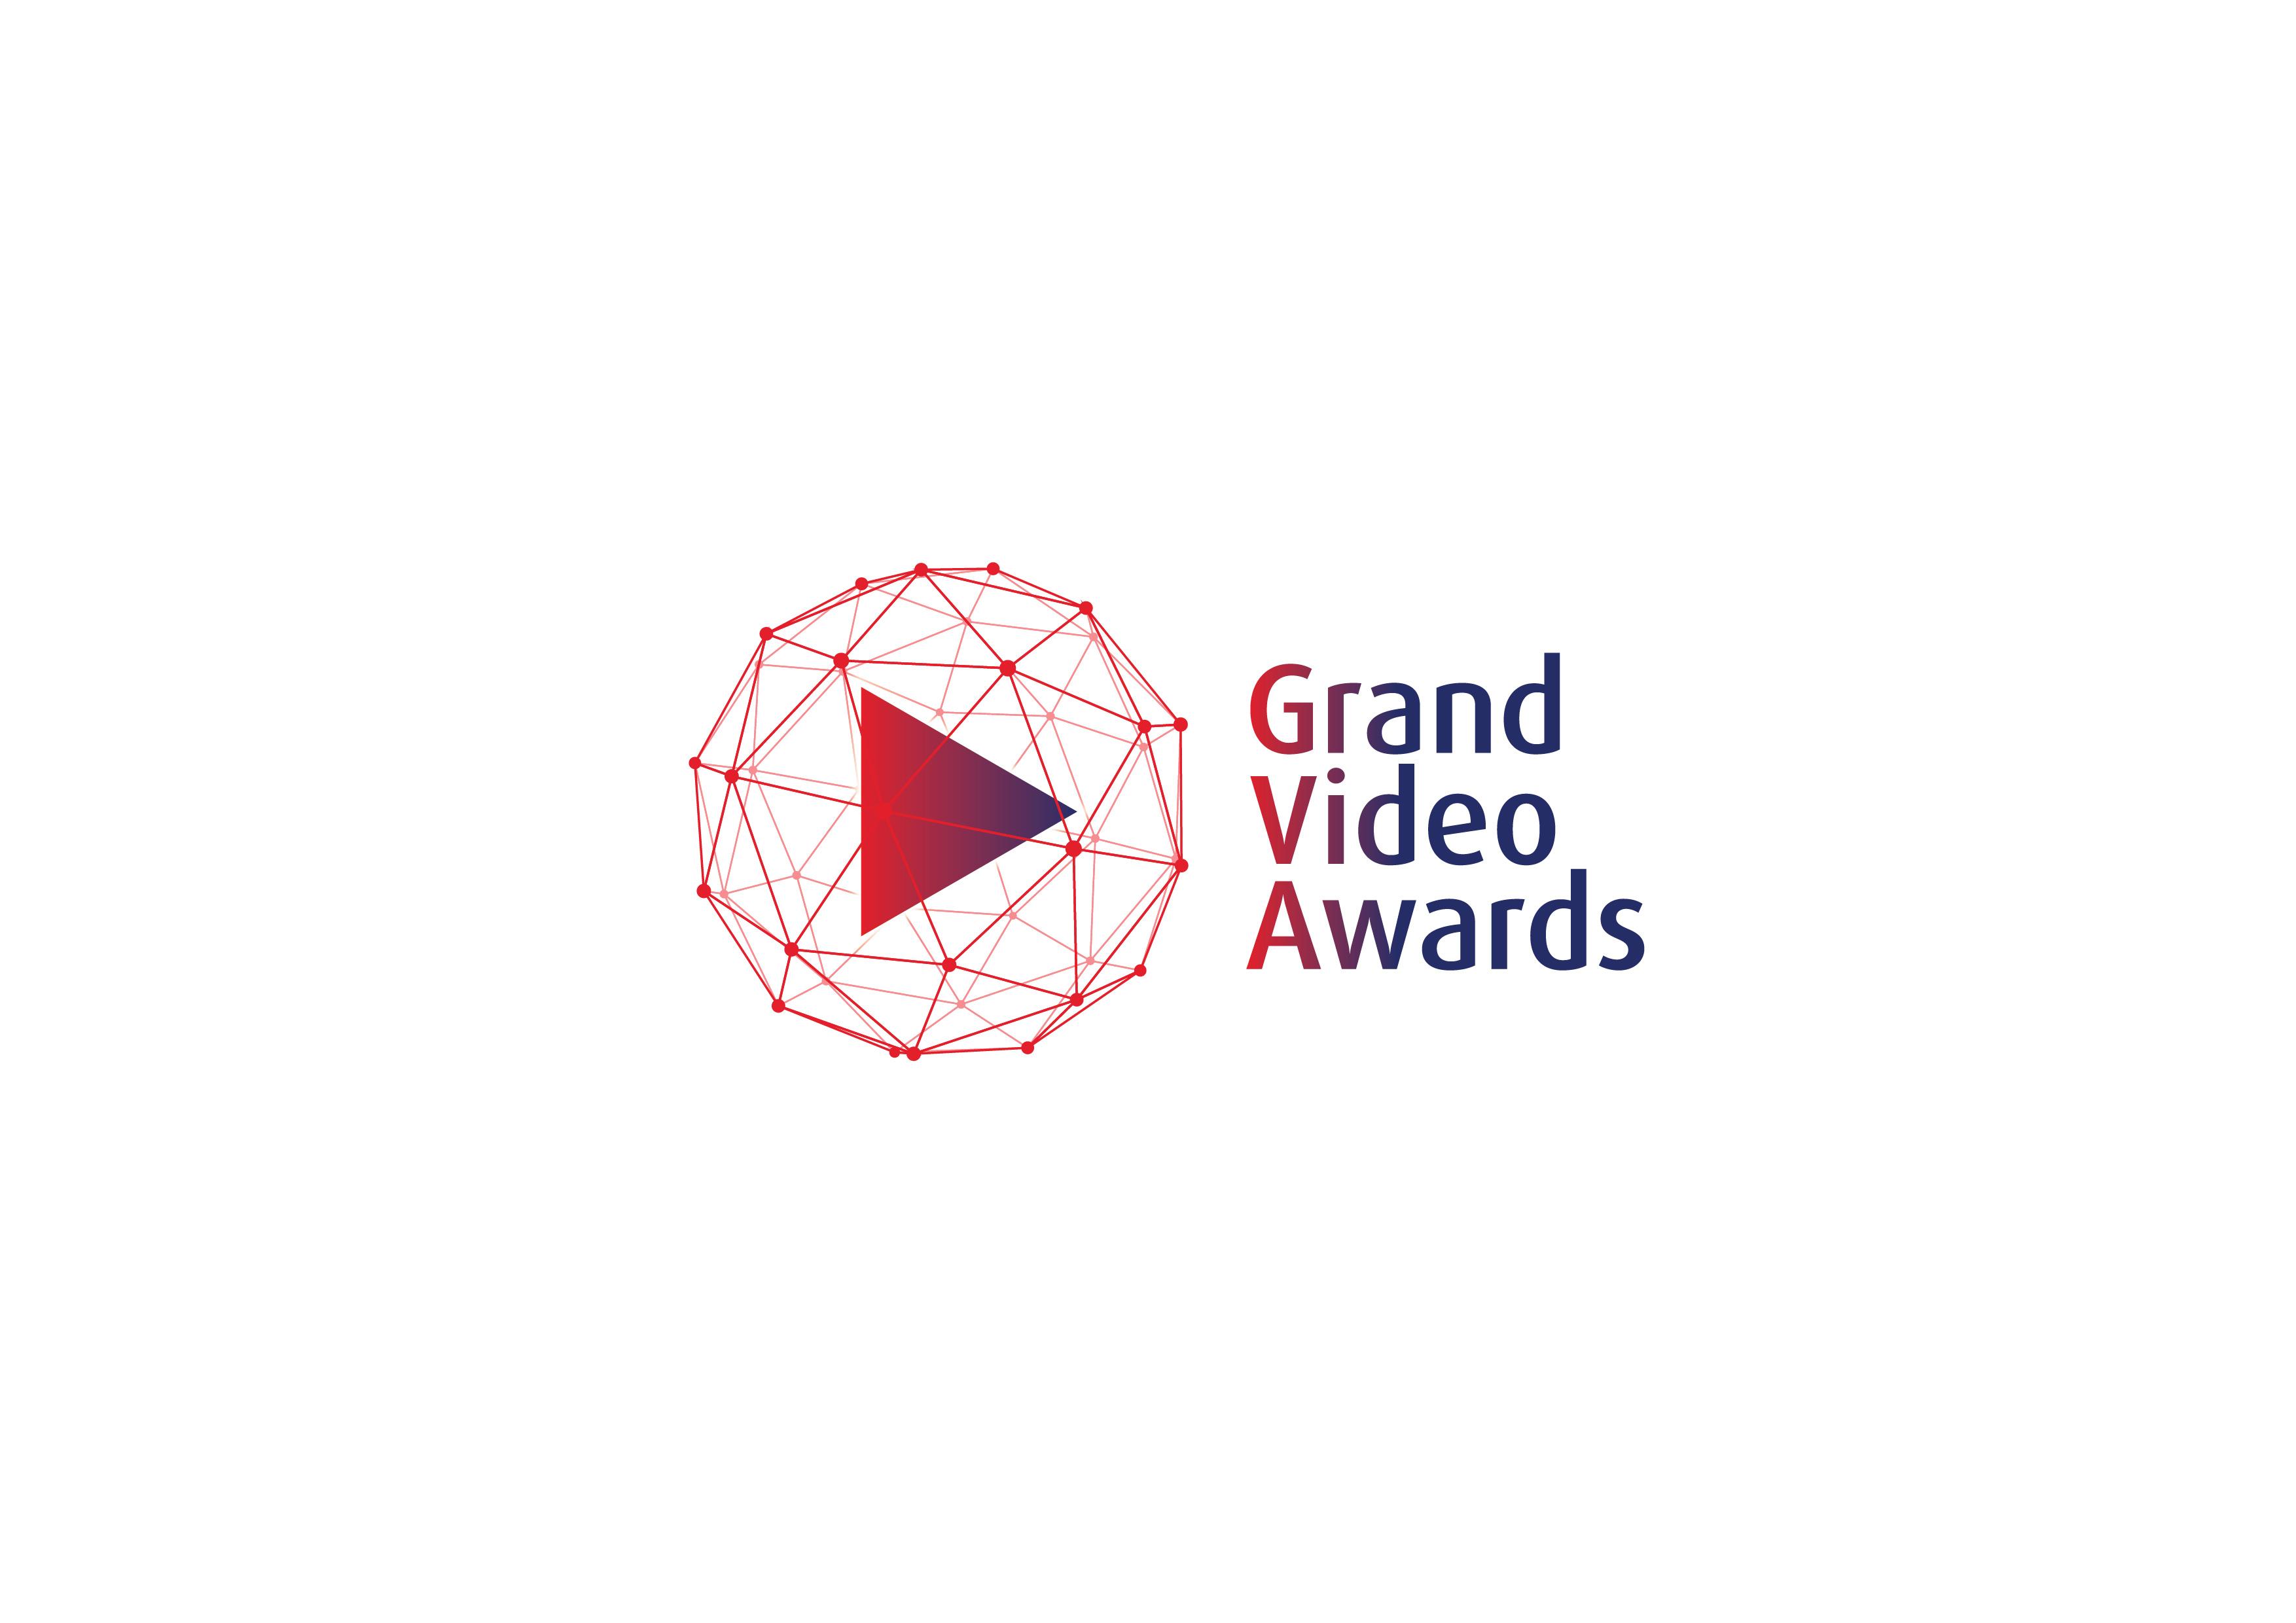 Grand Video Avards_5-01-2